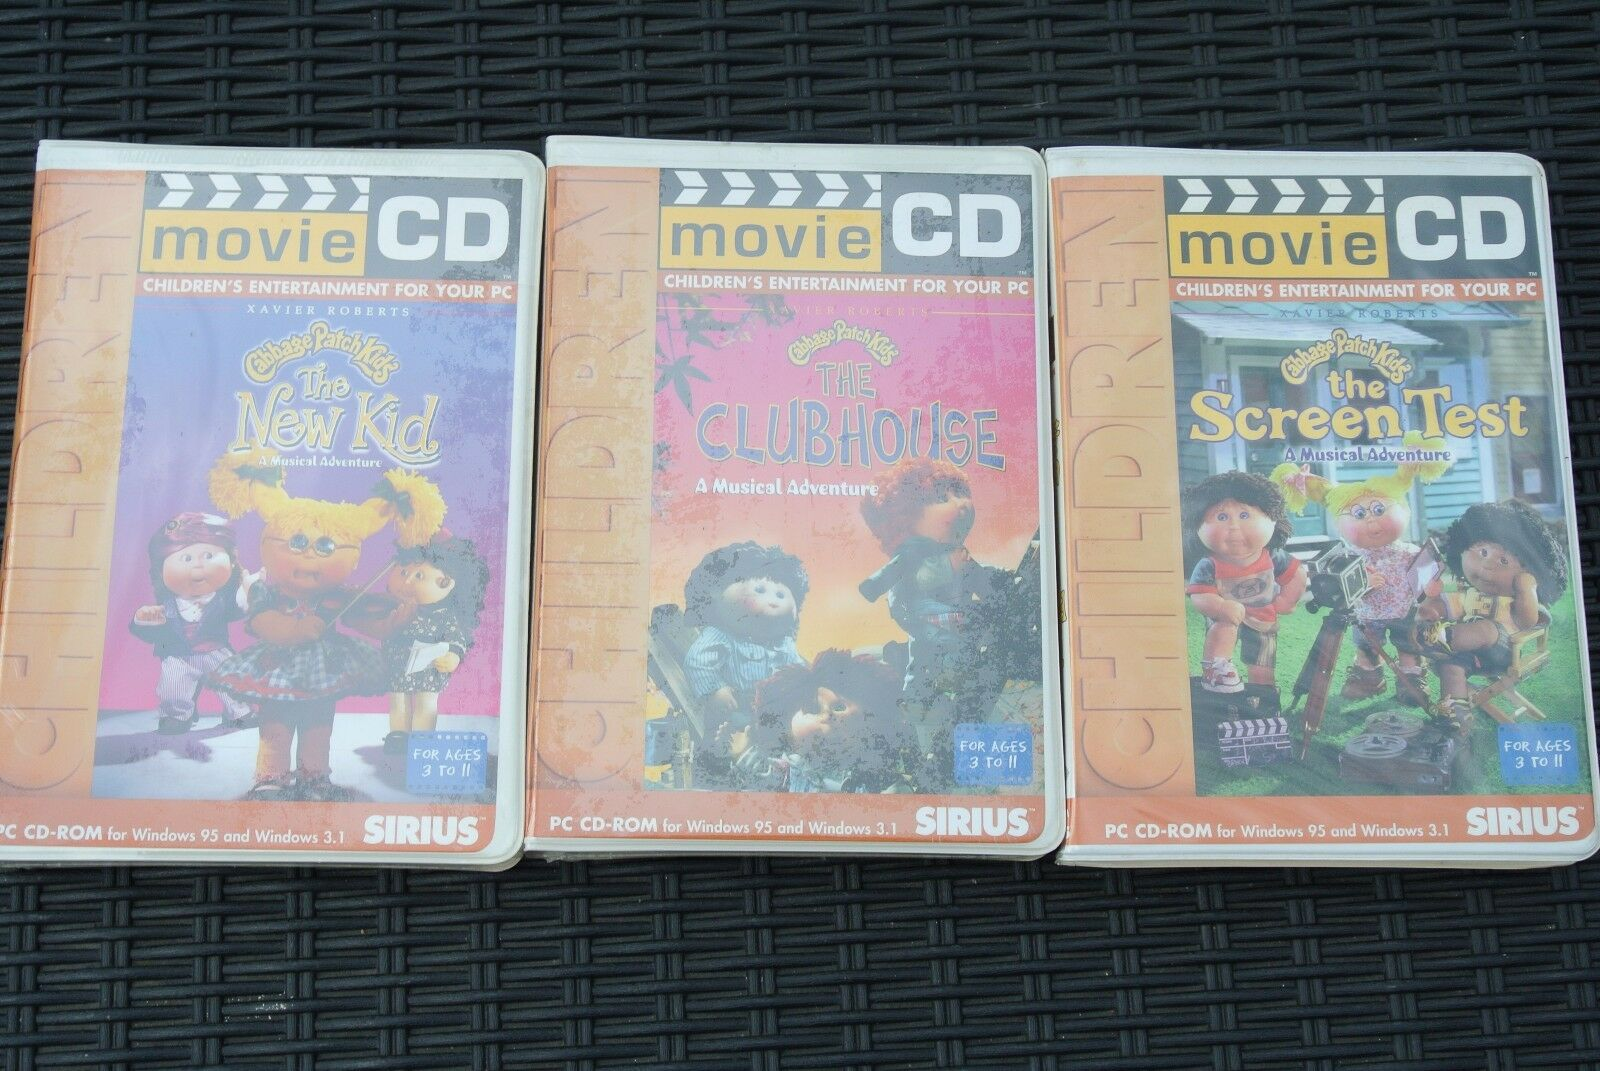 RARE 1995 CABBAGE PATCH KIDS FILM CD x 3 WIN 95 & Win 3.1 da Sirius Publishing